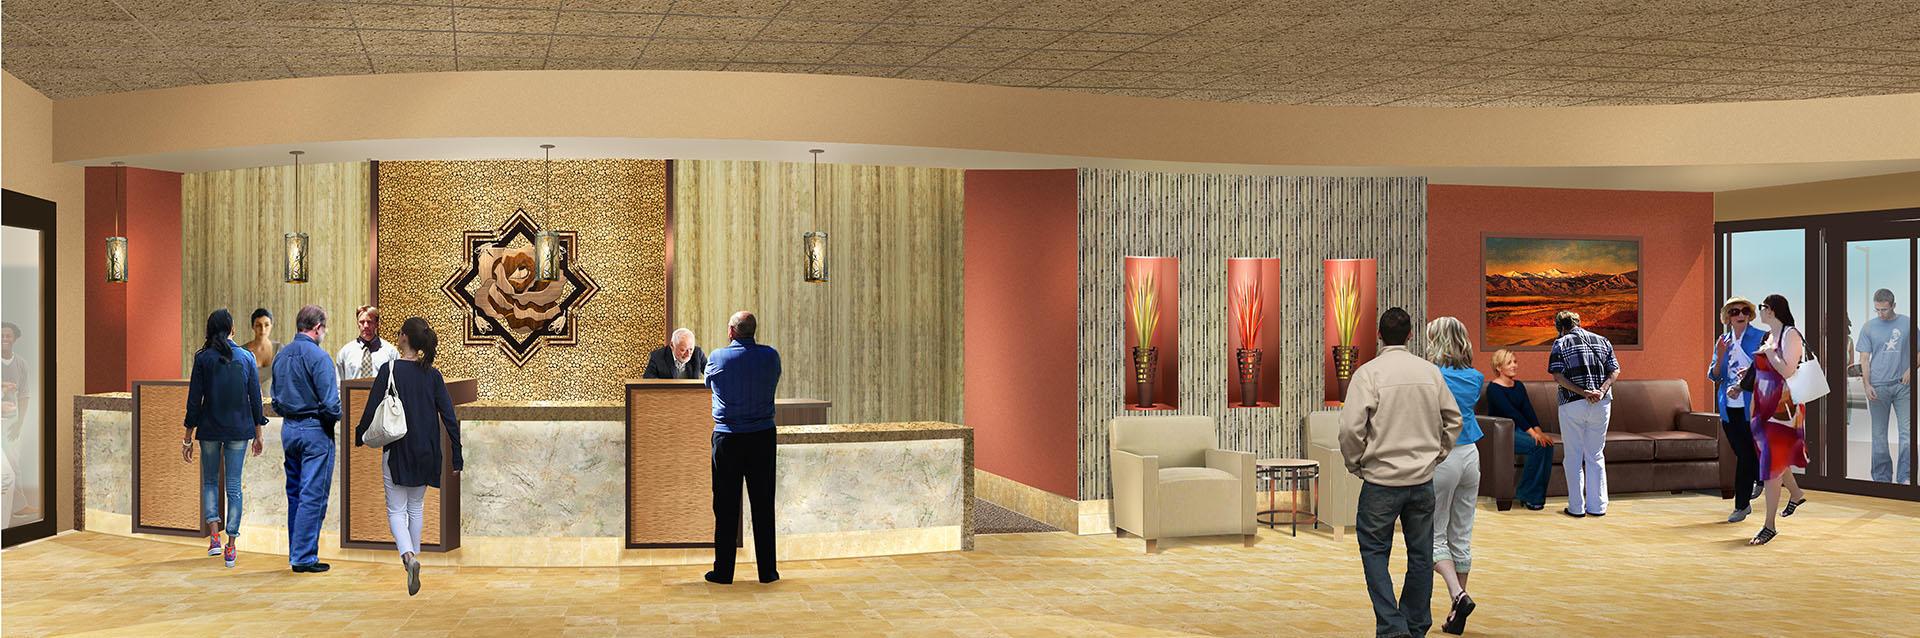 Shoshone Rose Casino and Hotel image 3